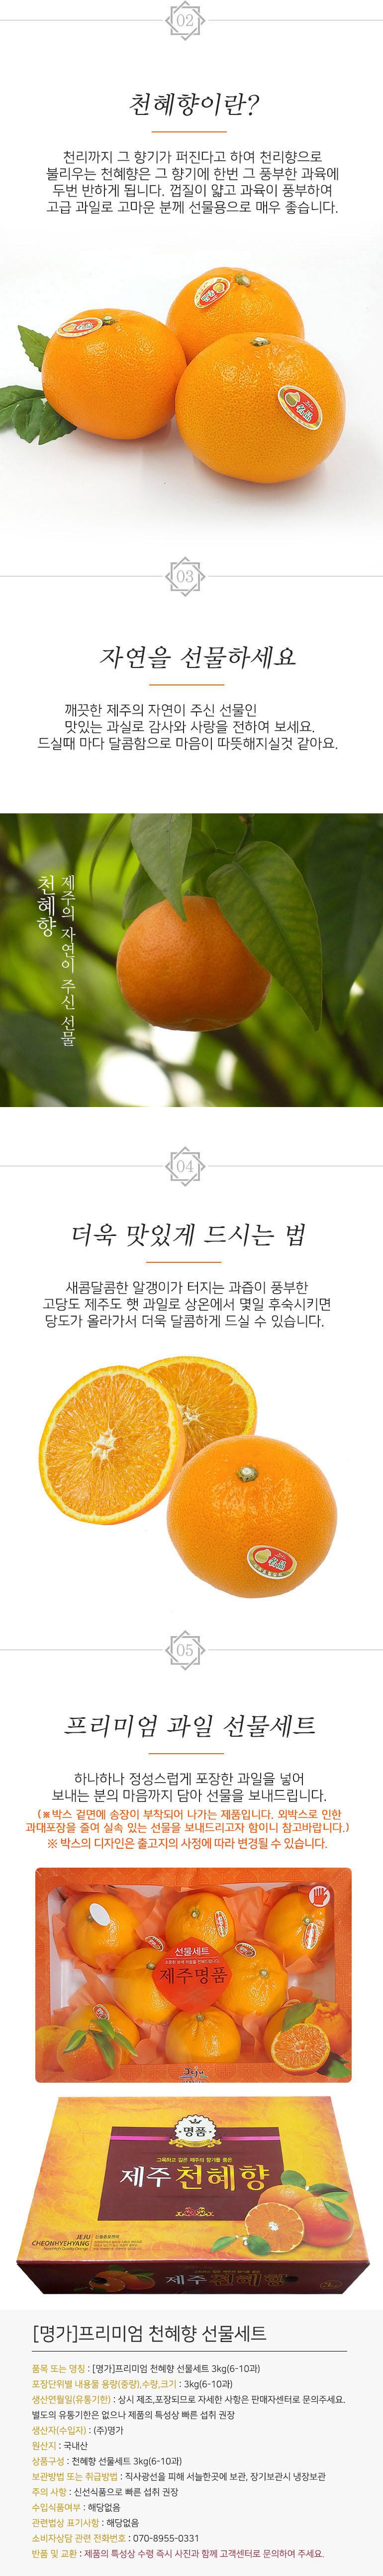 cheonhyehyang_02.jpg